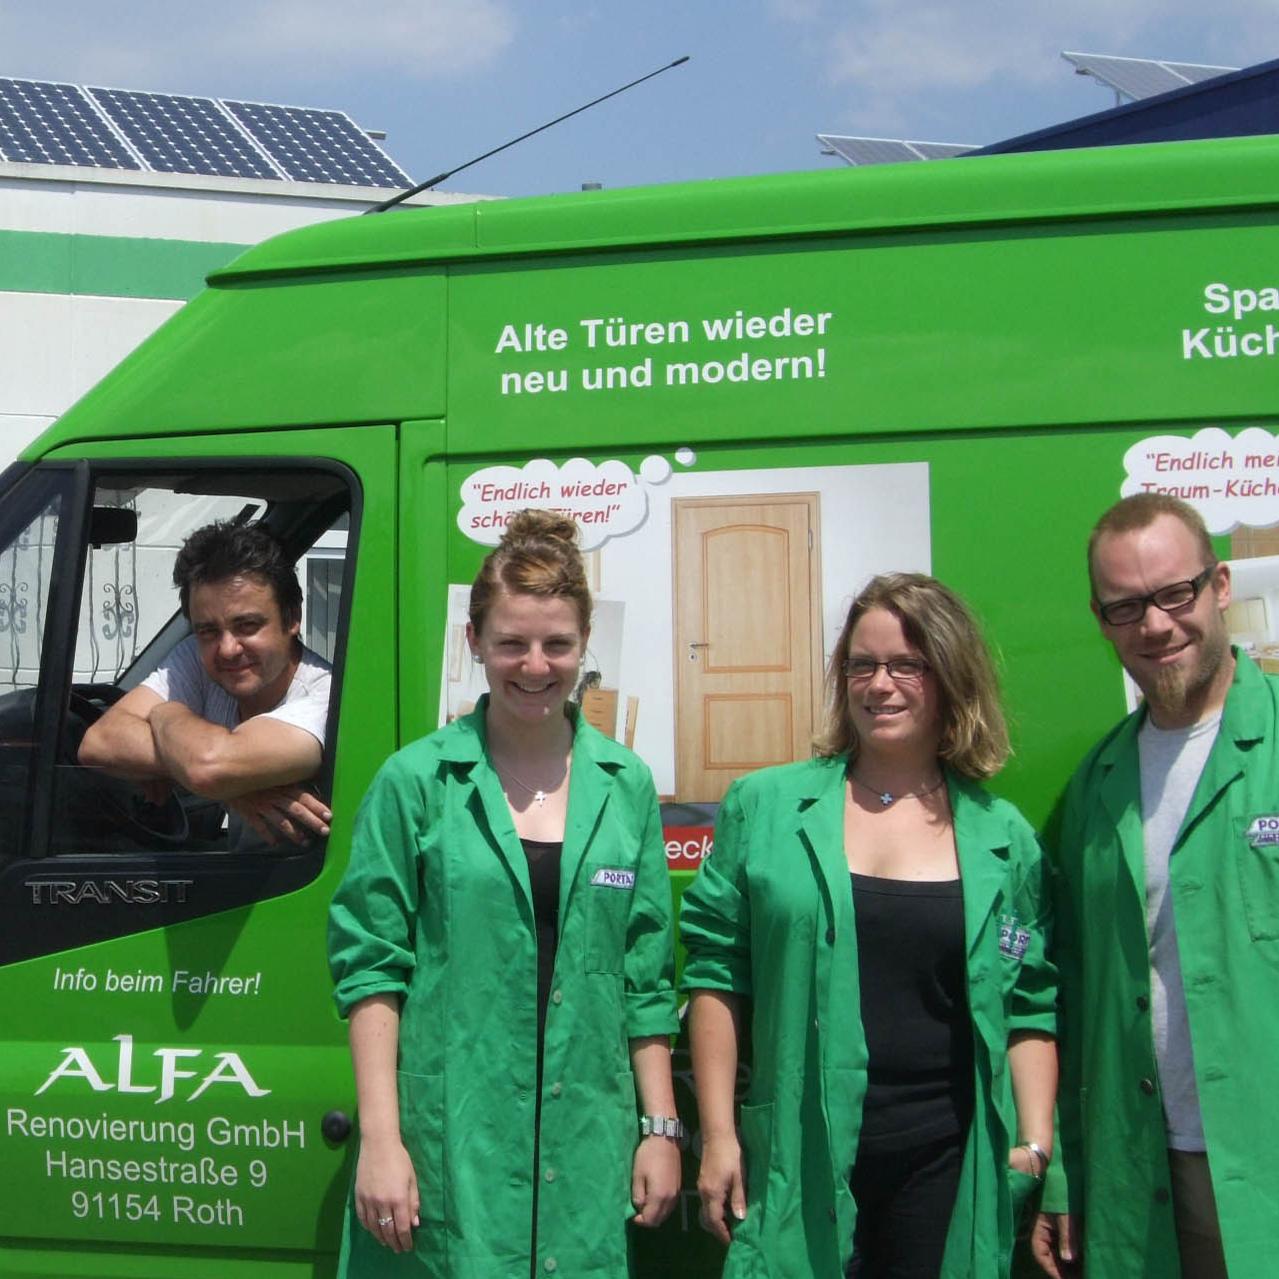 Foto de PORTAS-Fachbetrieb alfa-Renovierung GmbH Roth